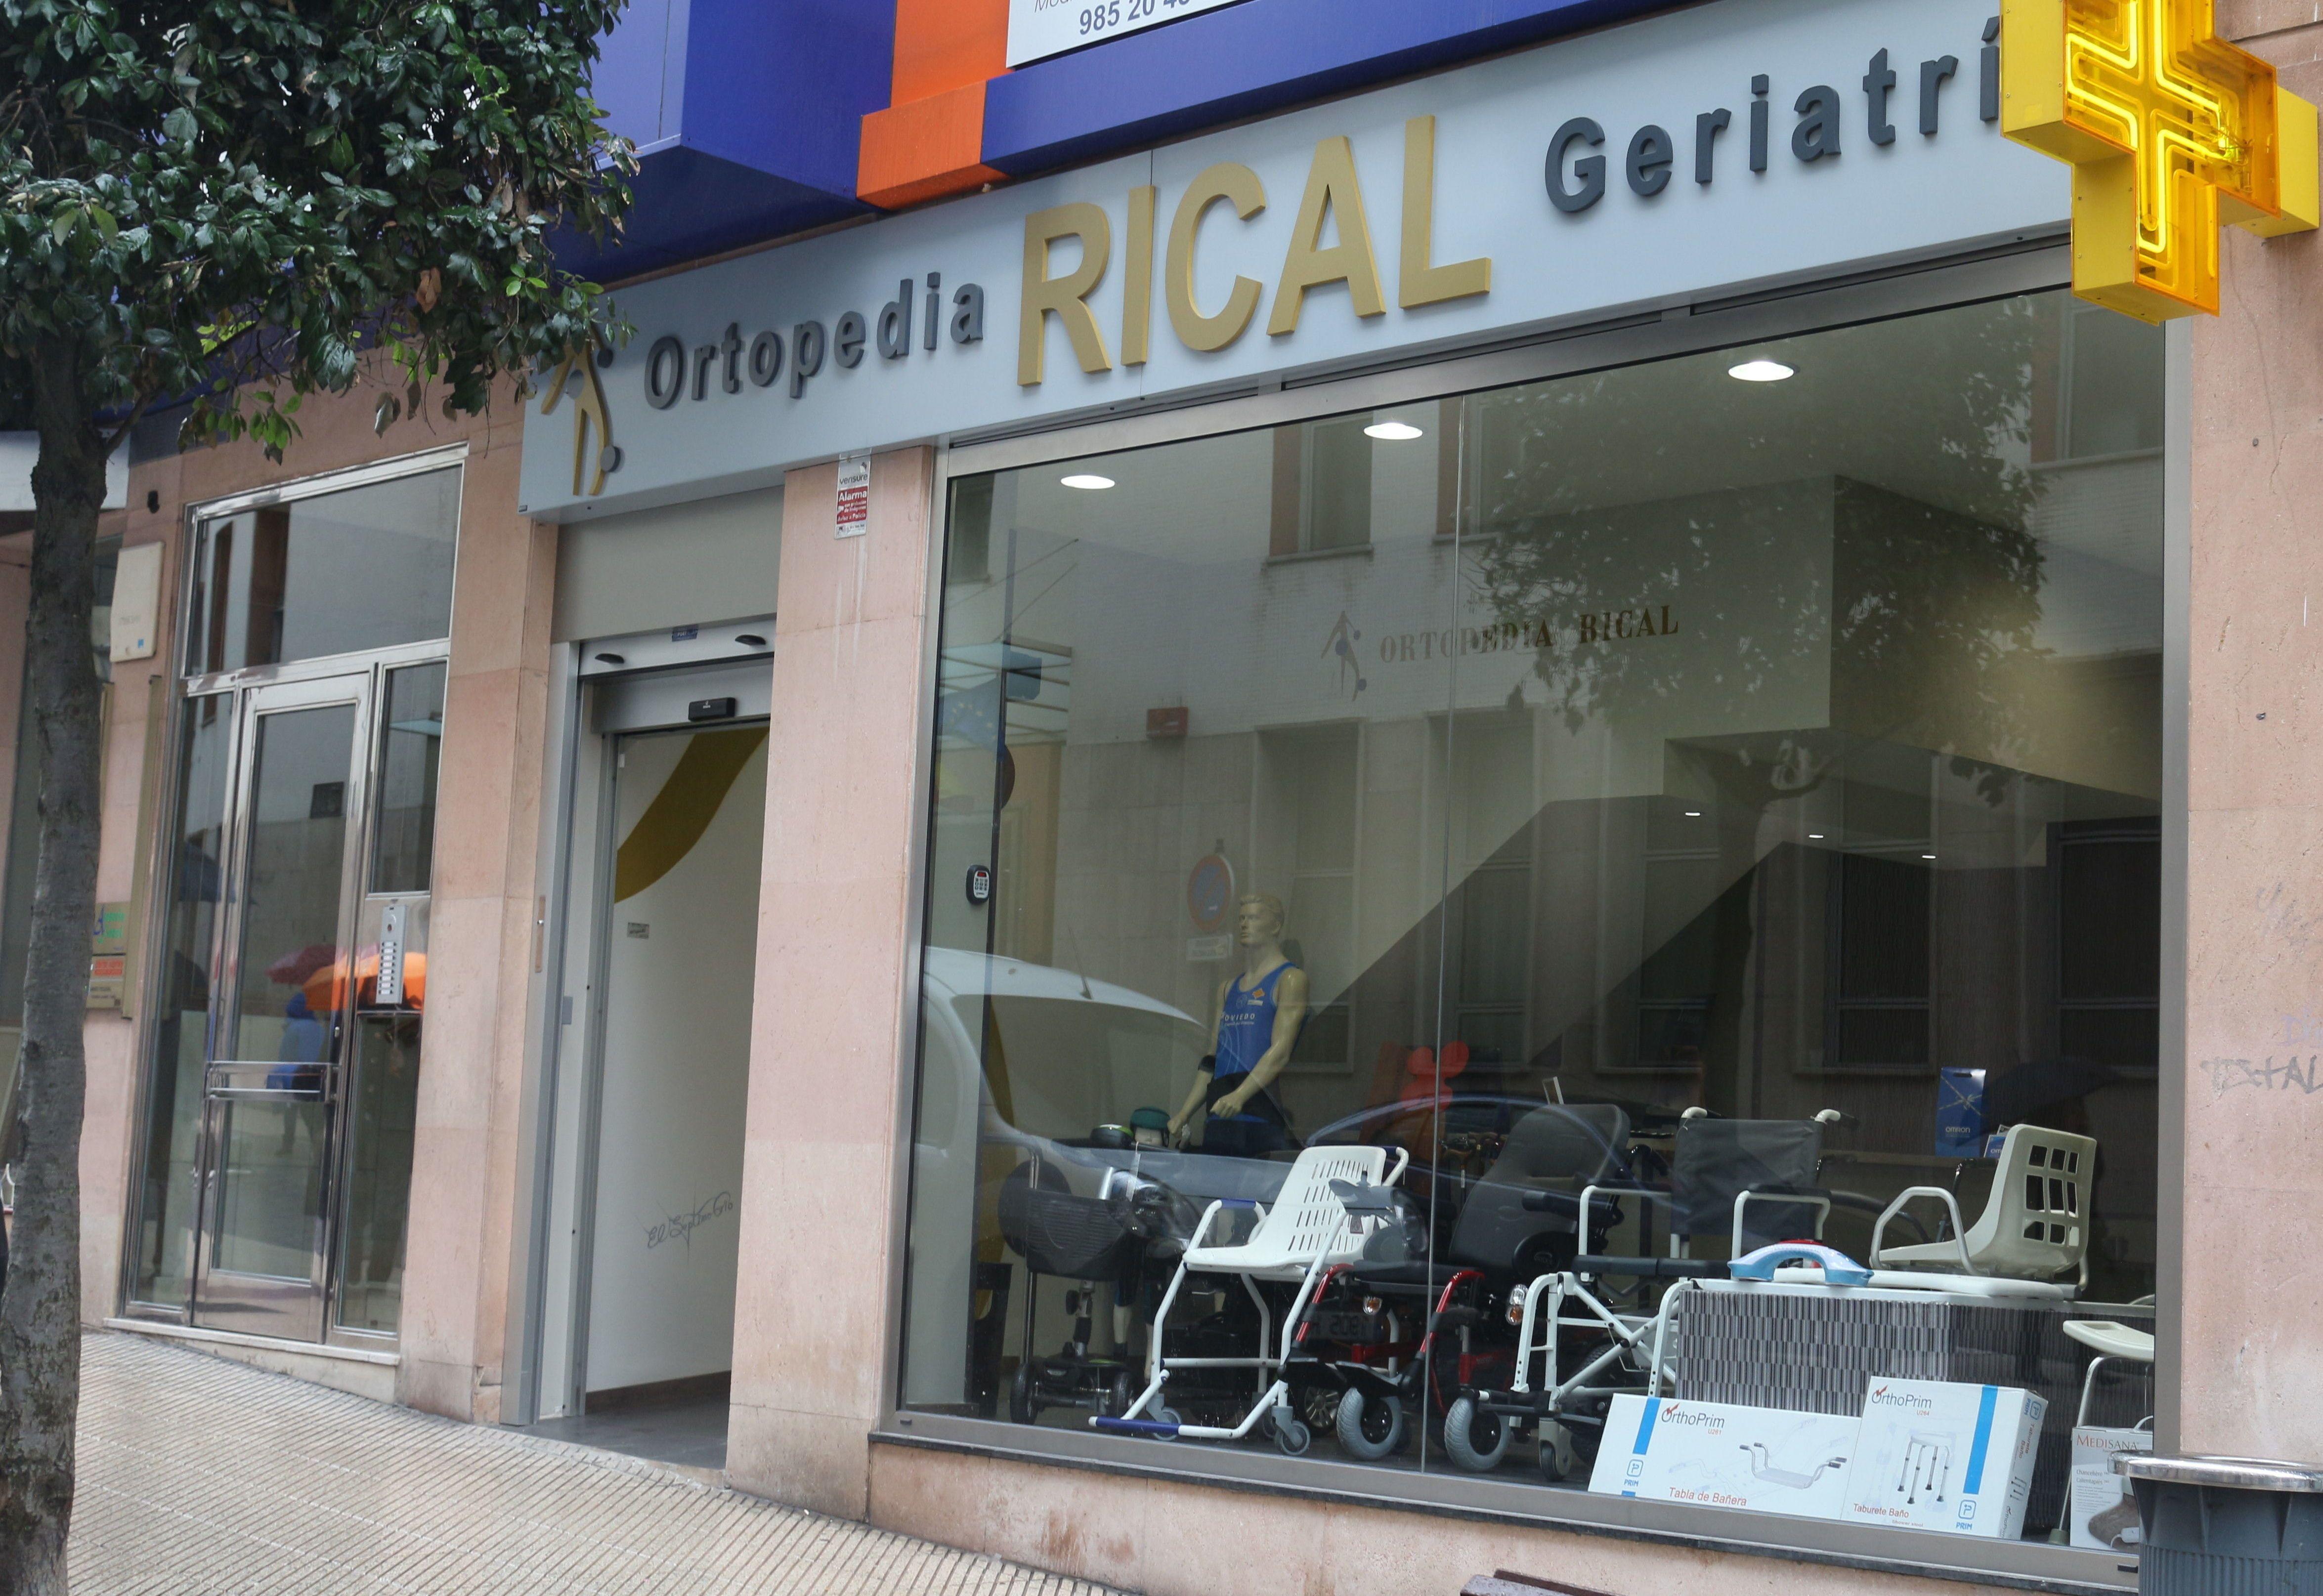 Alquiler sillas de ruedas asturias ortopedias en asturias - Alquiler de sillas de ruedas en valencia ...